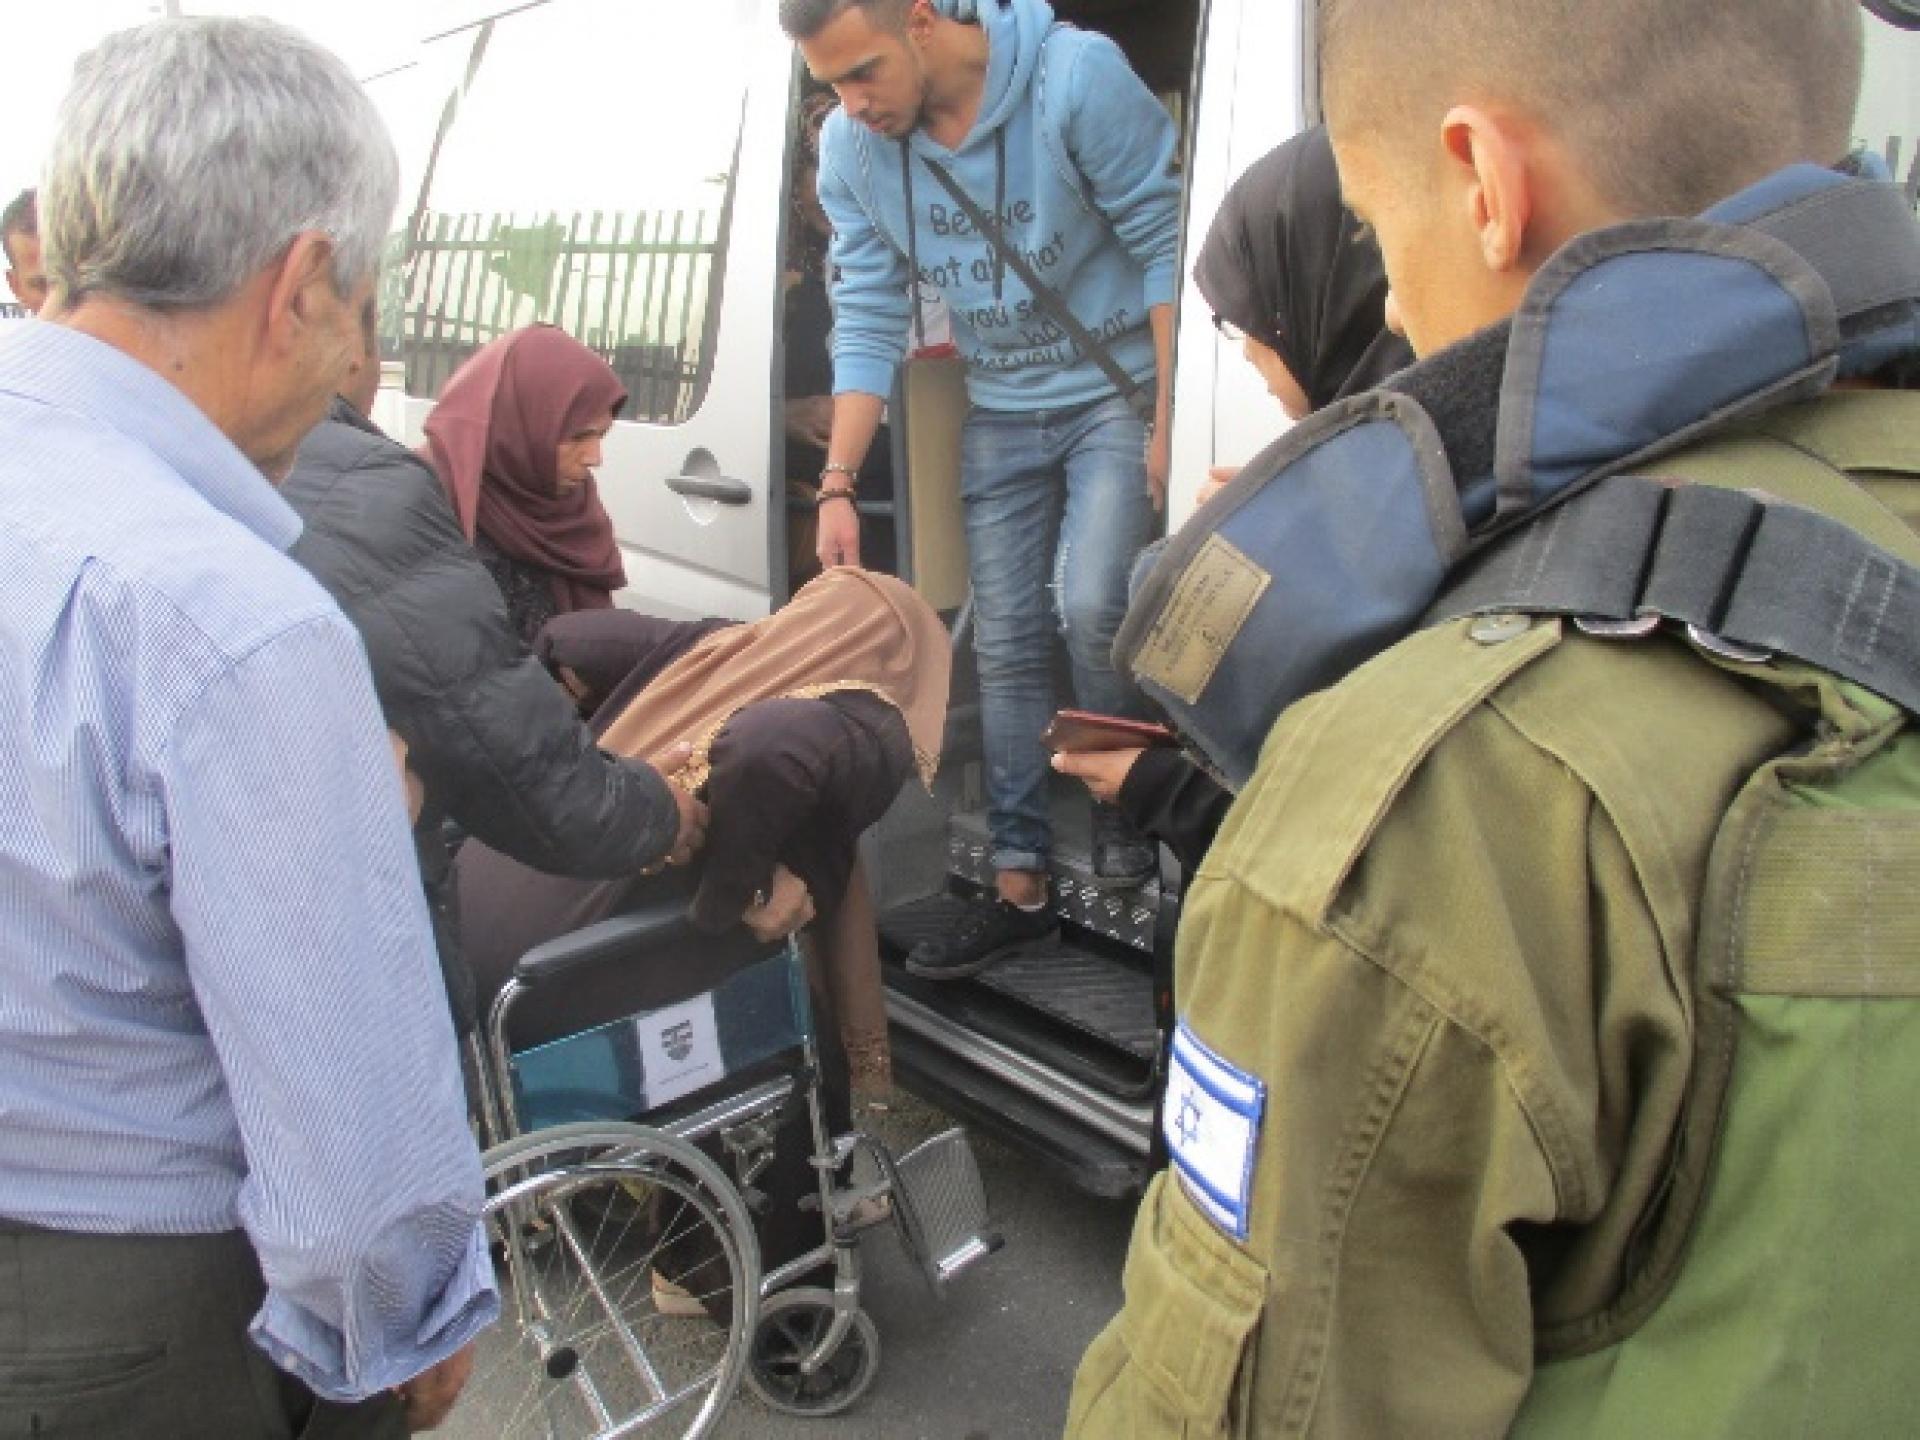 Returning to Gaza